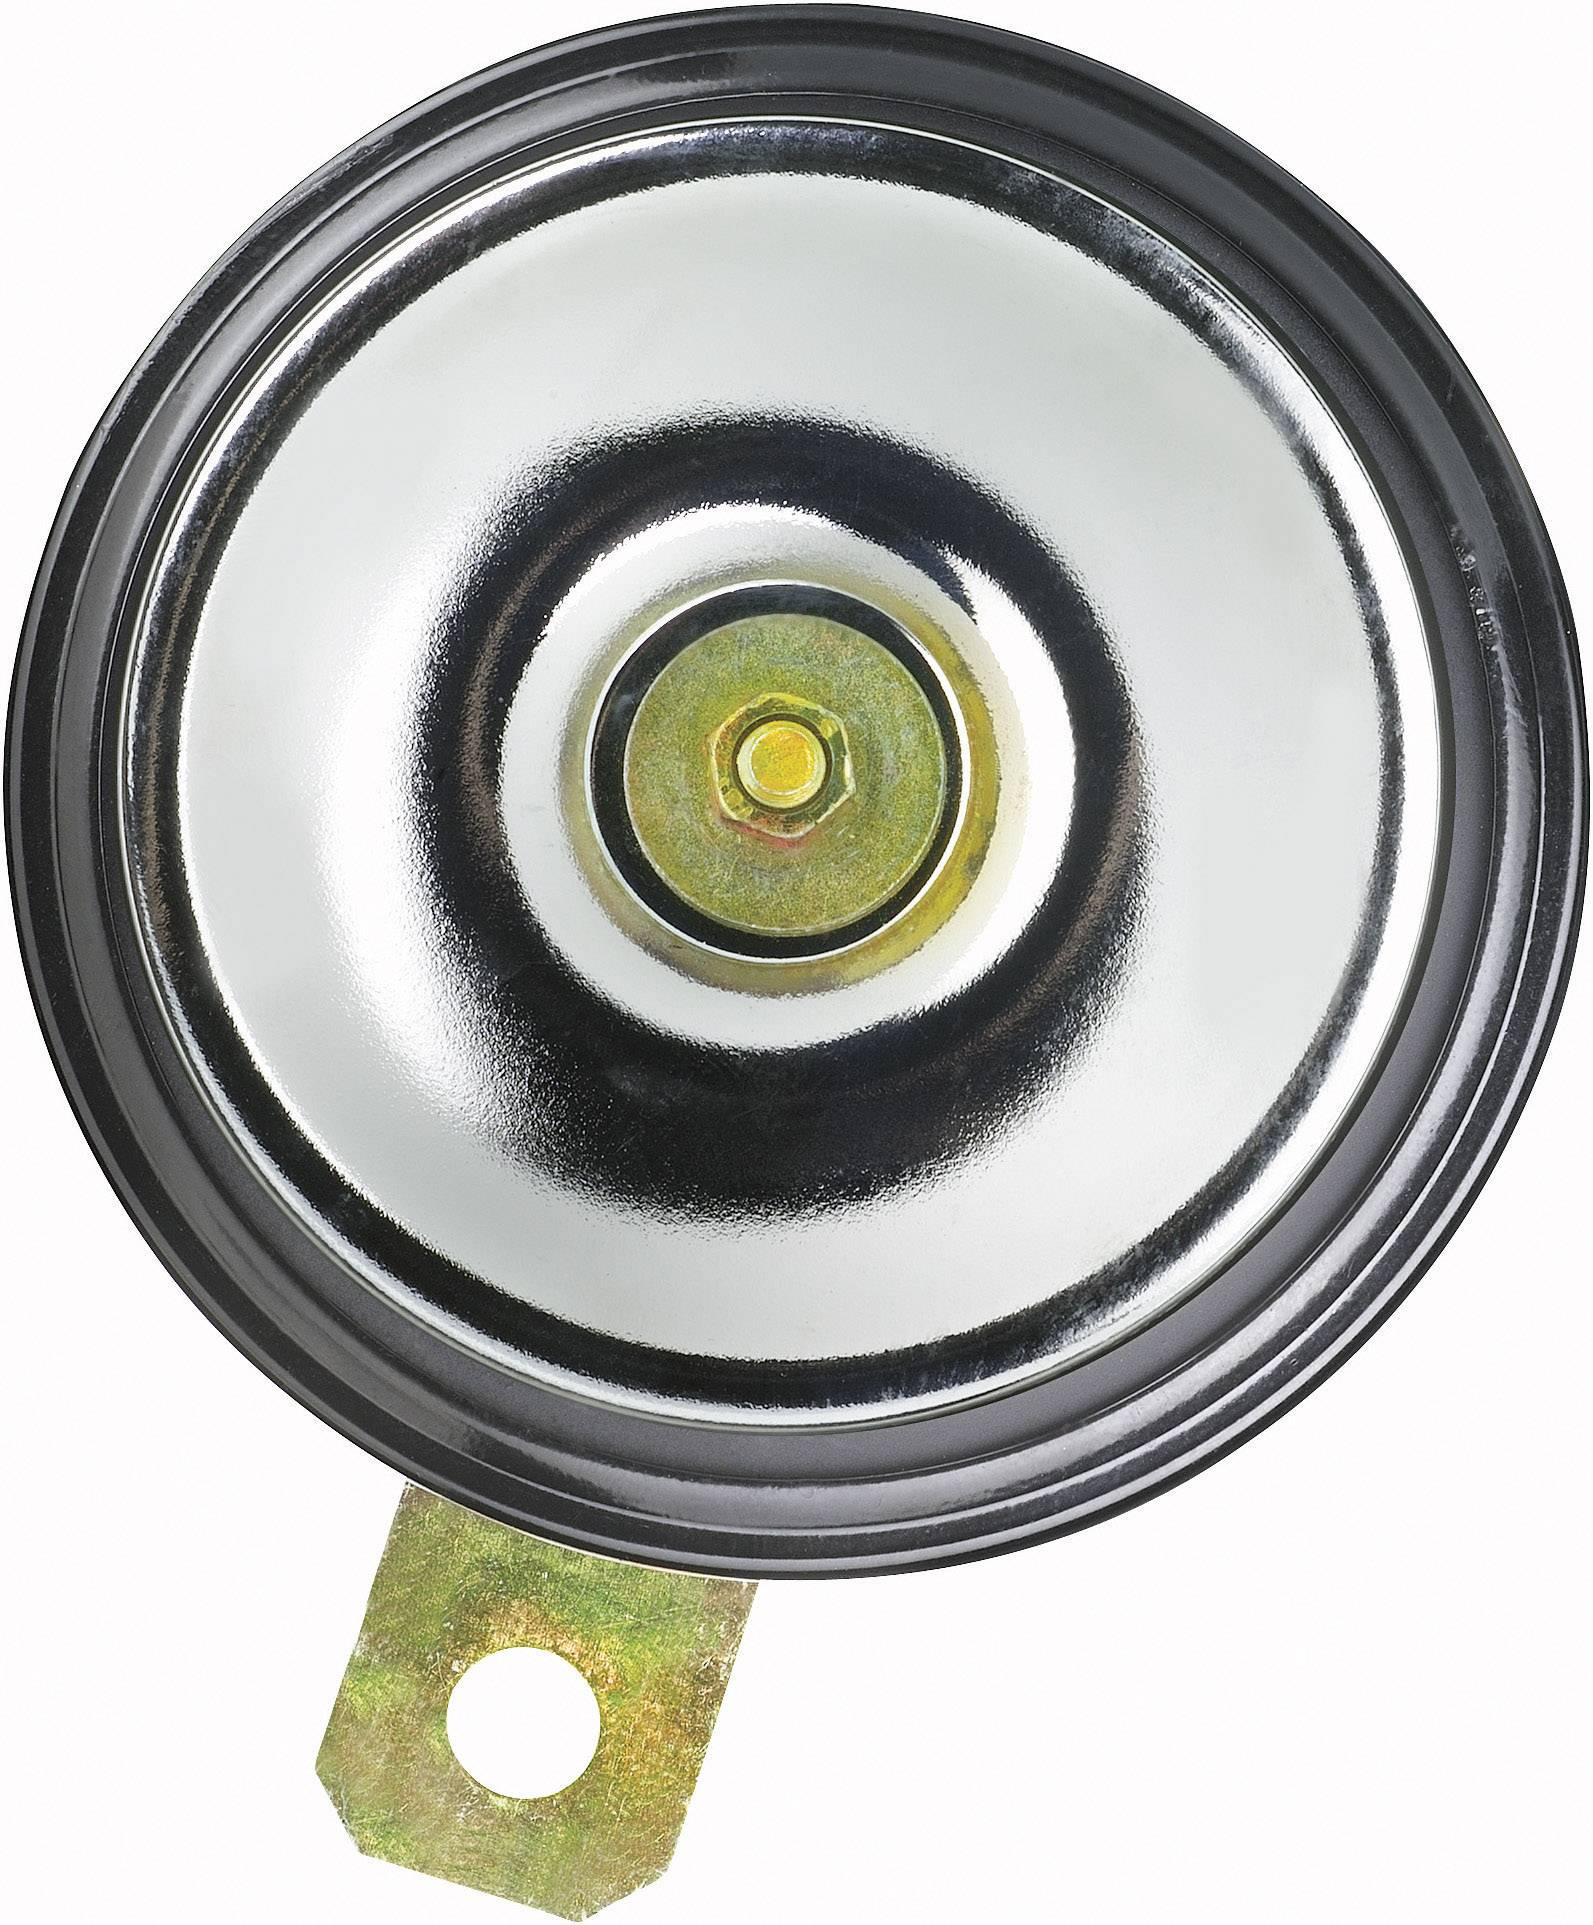 HP Autozubehör 10700, 12 V, 105 dB, chróm